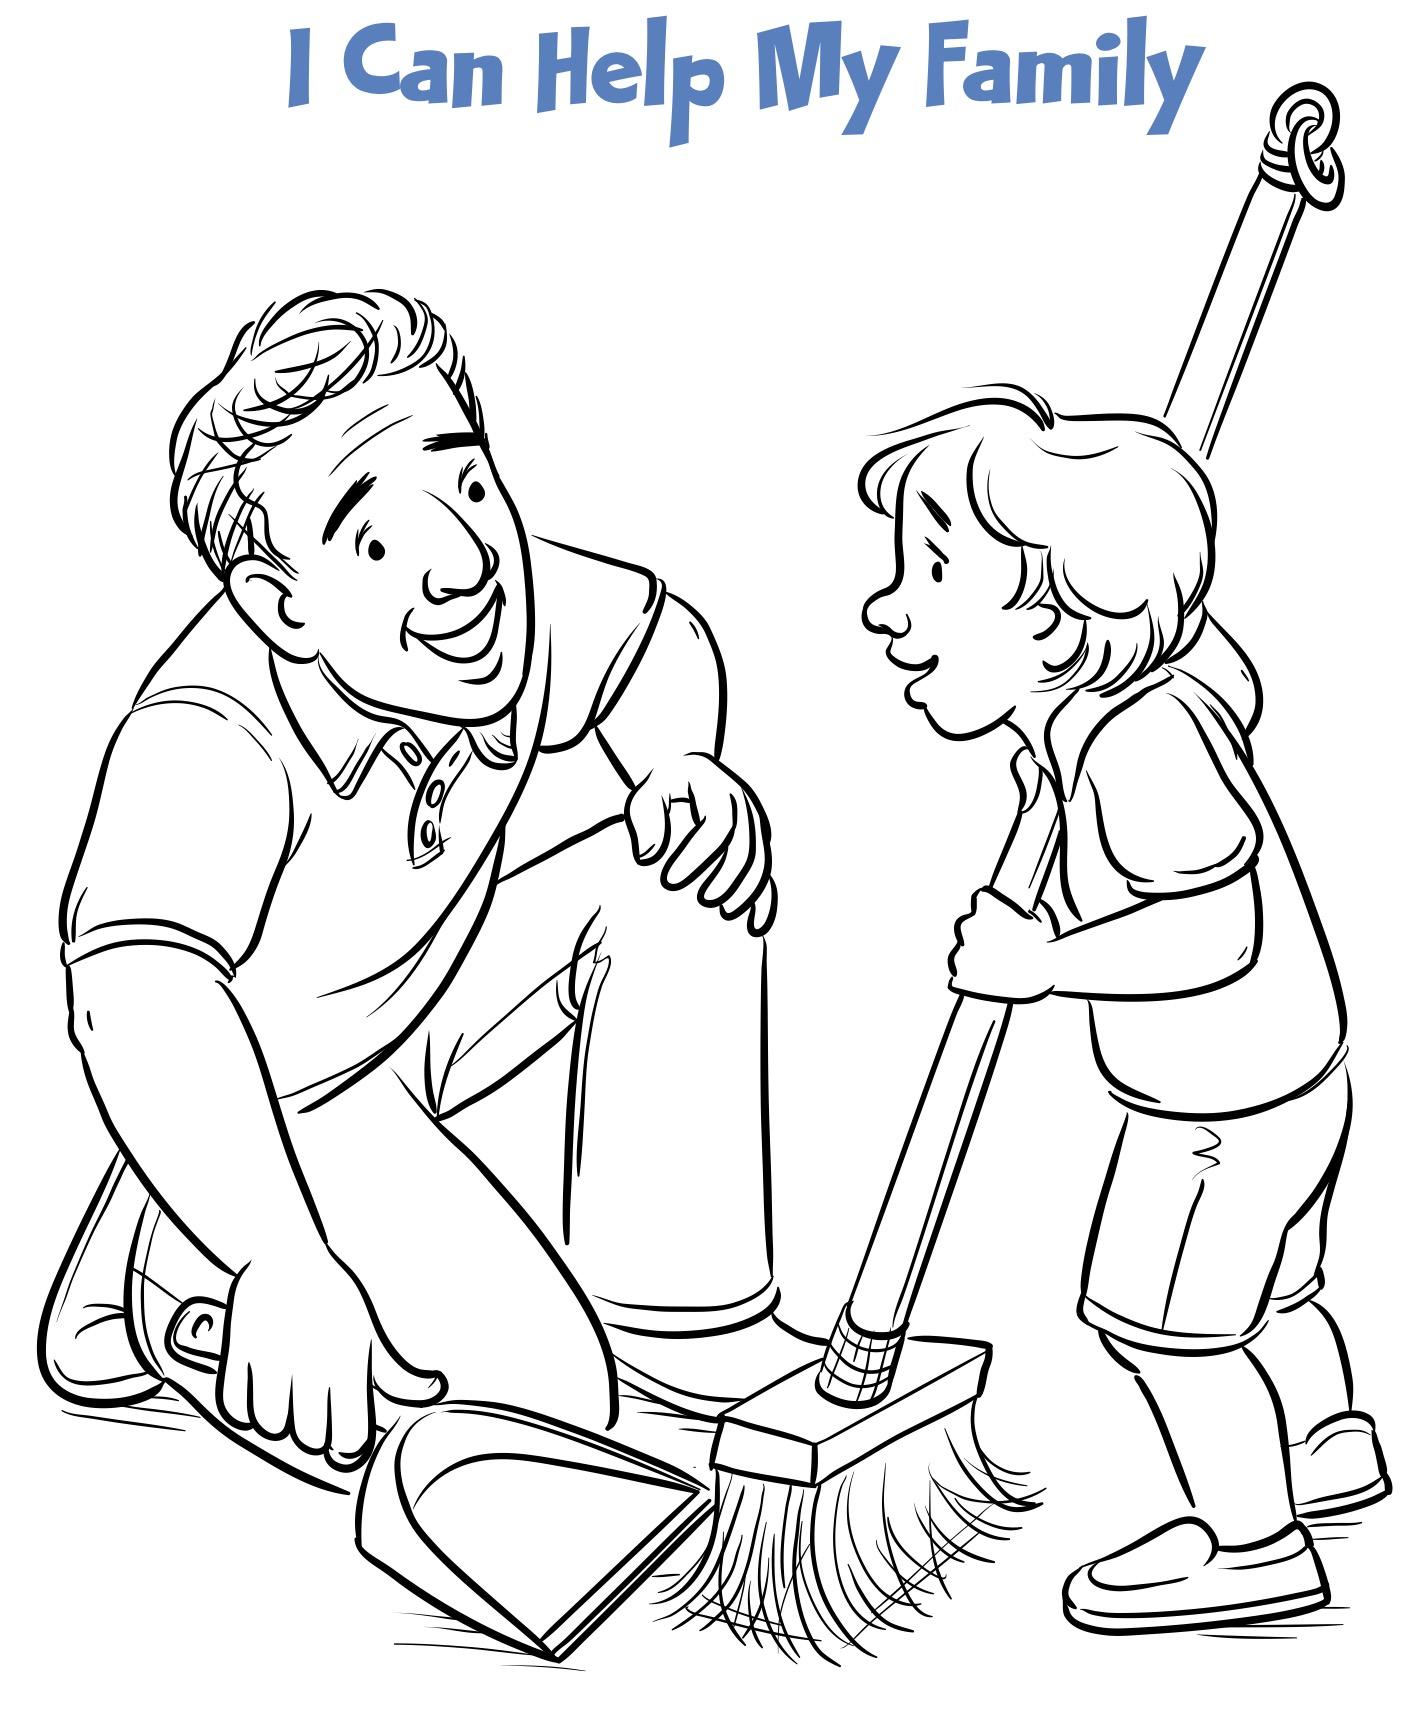 draw clipart kid responsibility